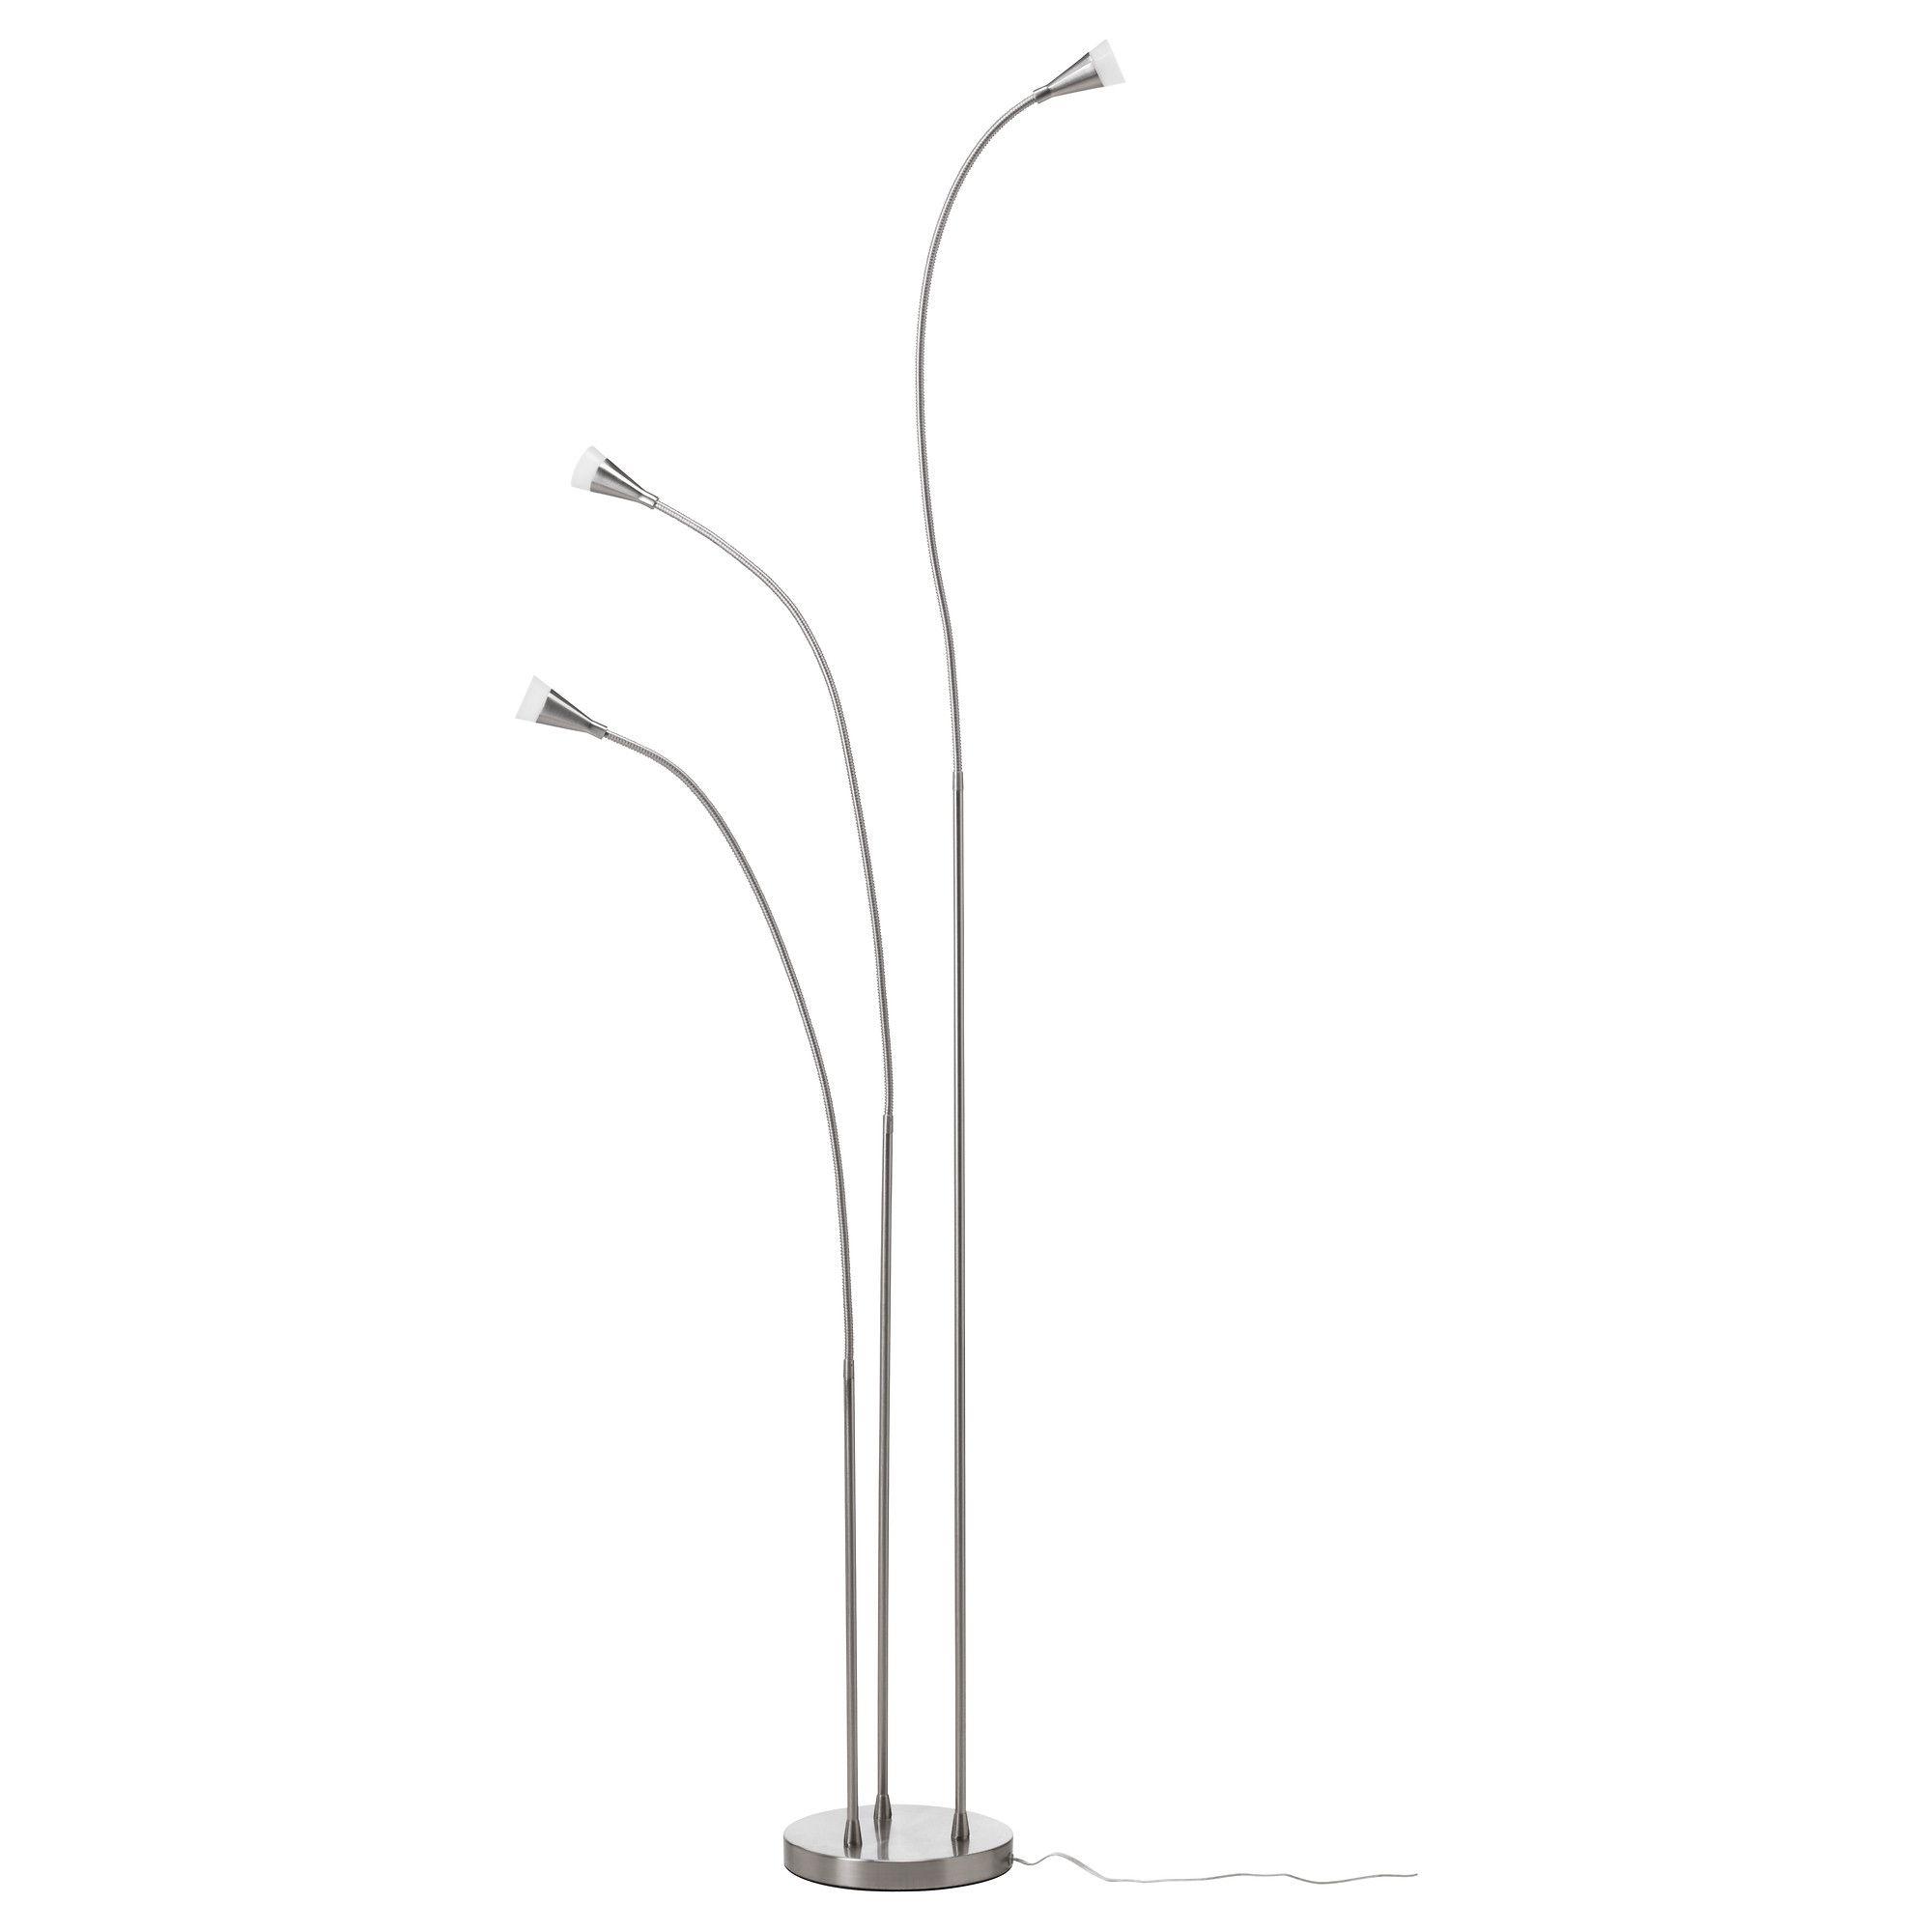 Us Furniture And Home Furnishings Flexible Floor Lamp Floor Lamp Led Floor Lamp